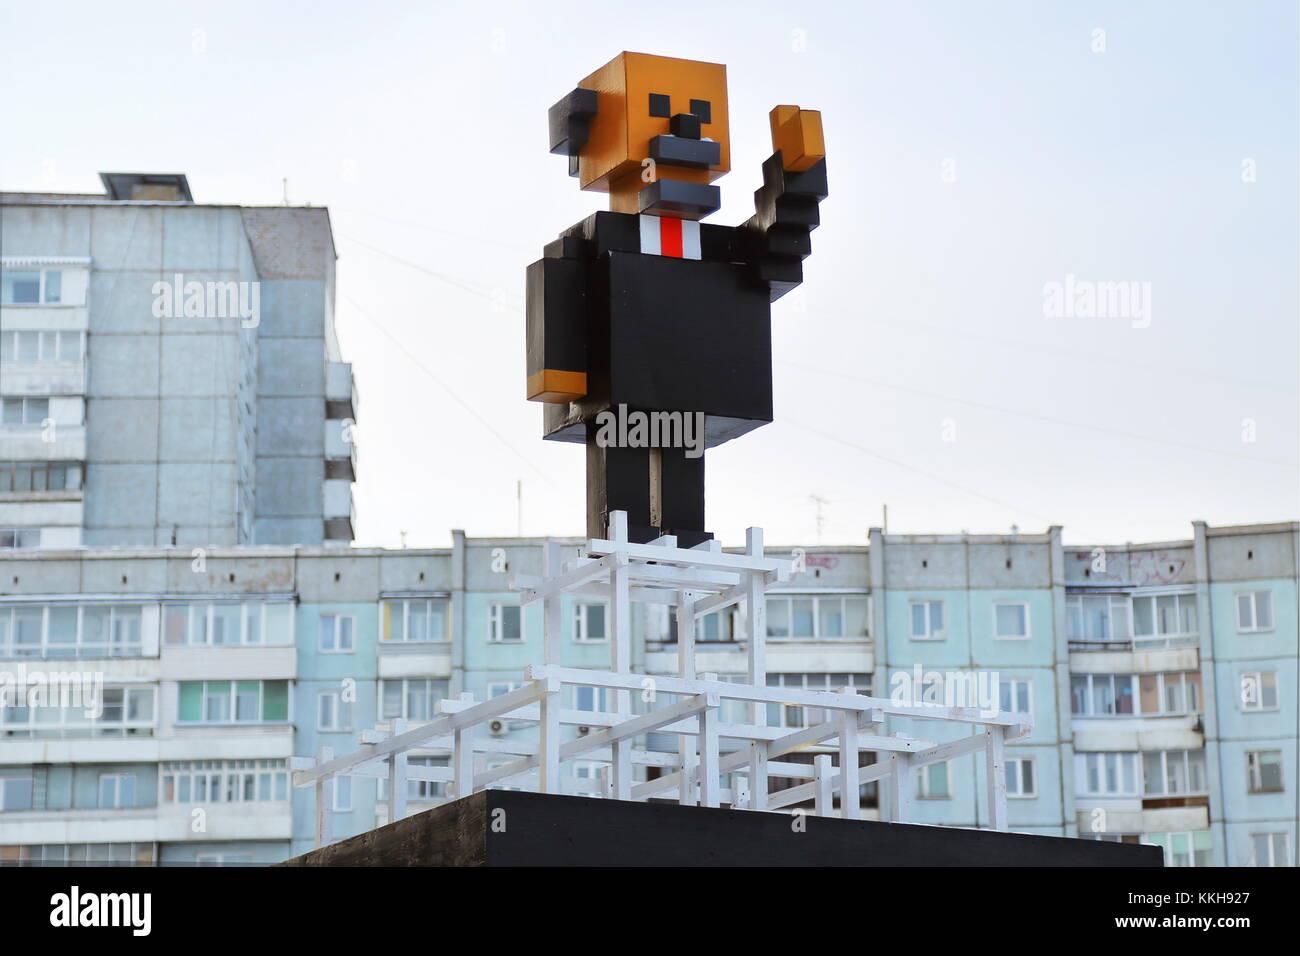 Krasnoyarsk, Russia. 1st Dec, 2017. A cardboard monument to Russian revolutionary Vladimir Lenin created by Alexander - Stock Image